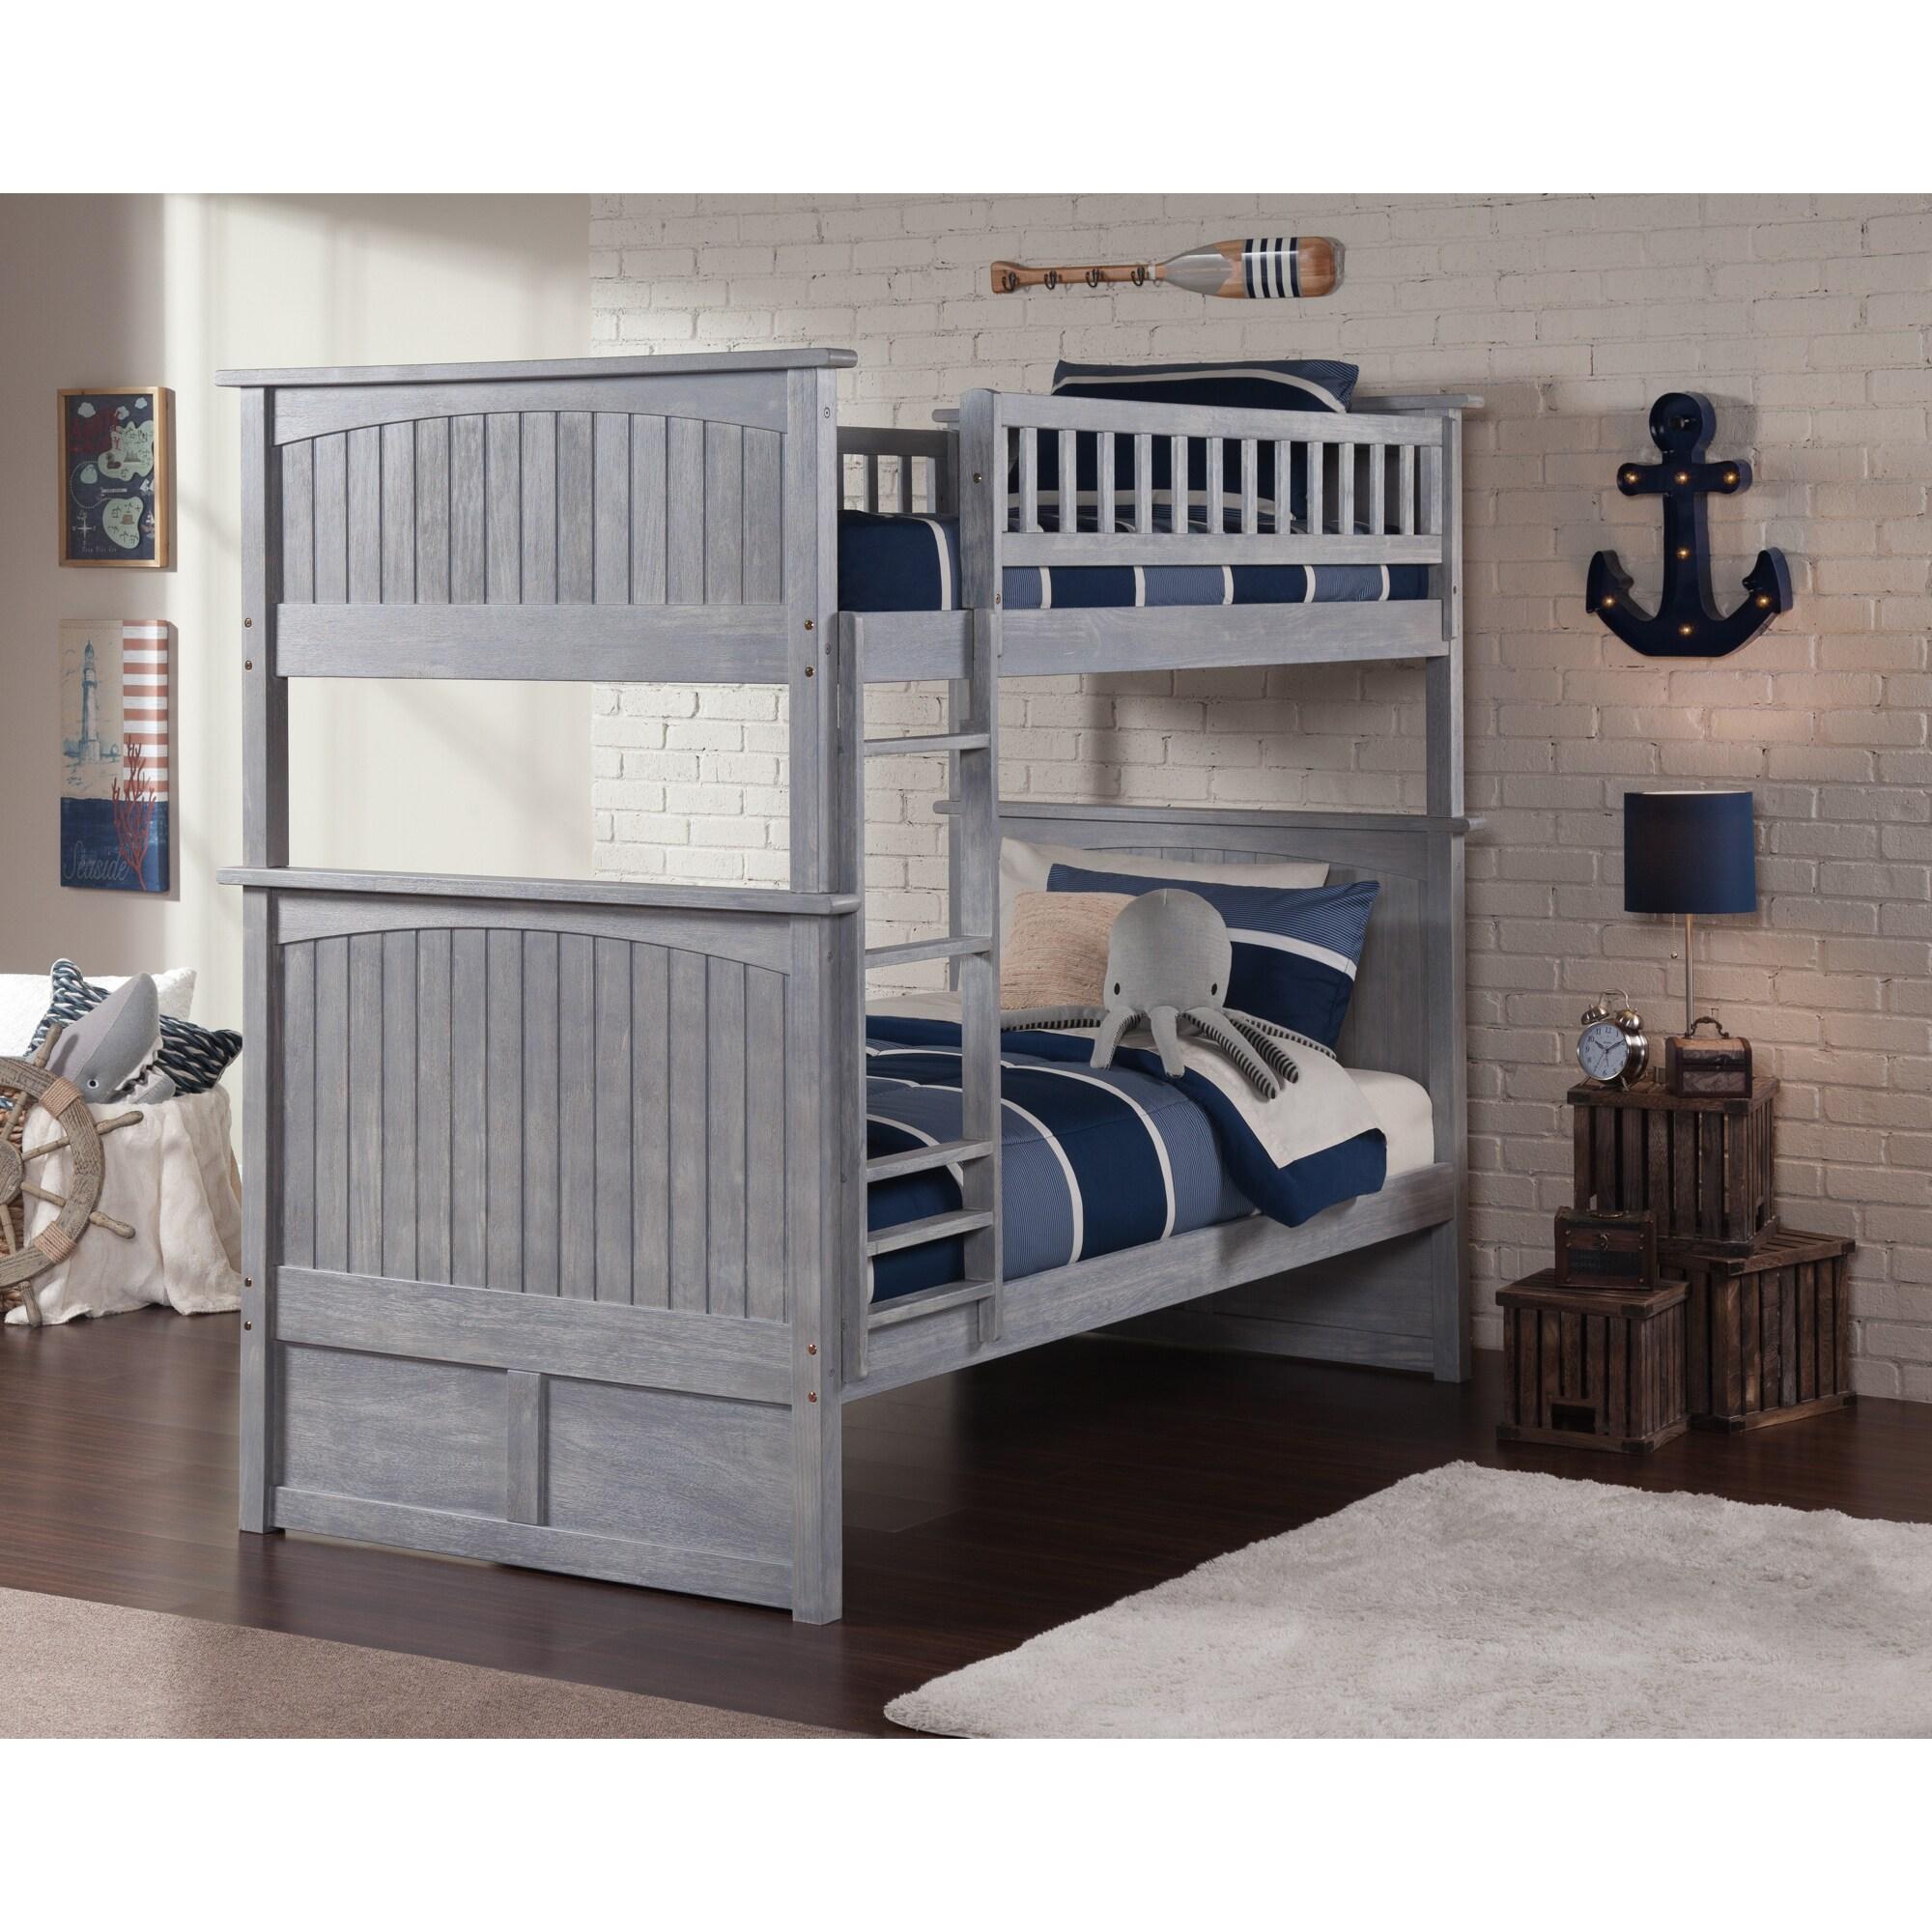 Shop Atlantic Nantucket Driftwood Washed Grey Wood Twin Bunk Bed